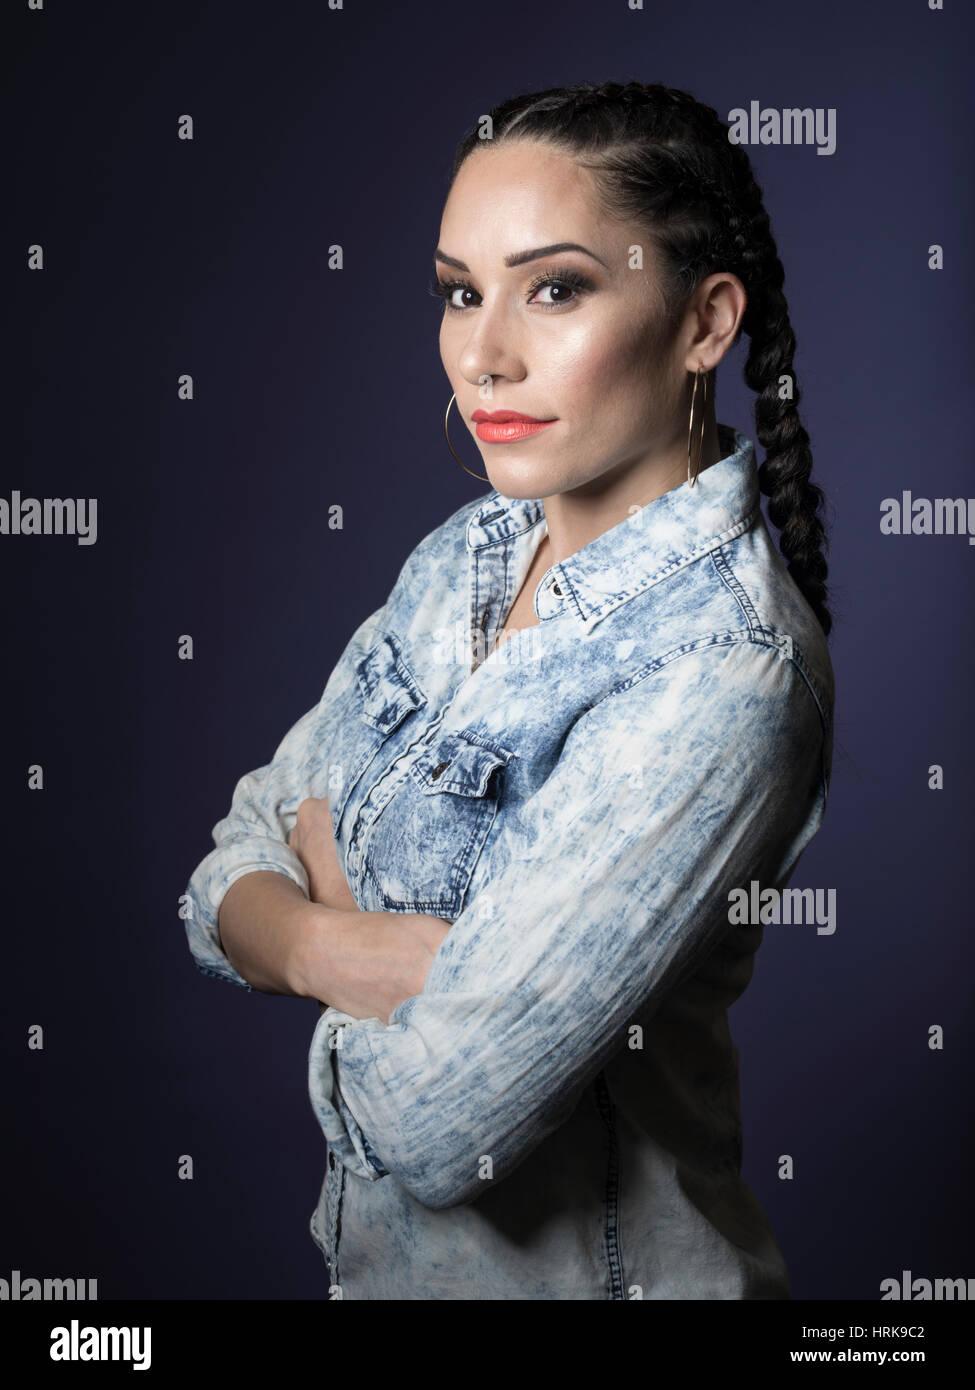 Hispanic woman with ponytails and denim shirt - Stock Image